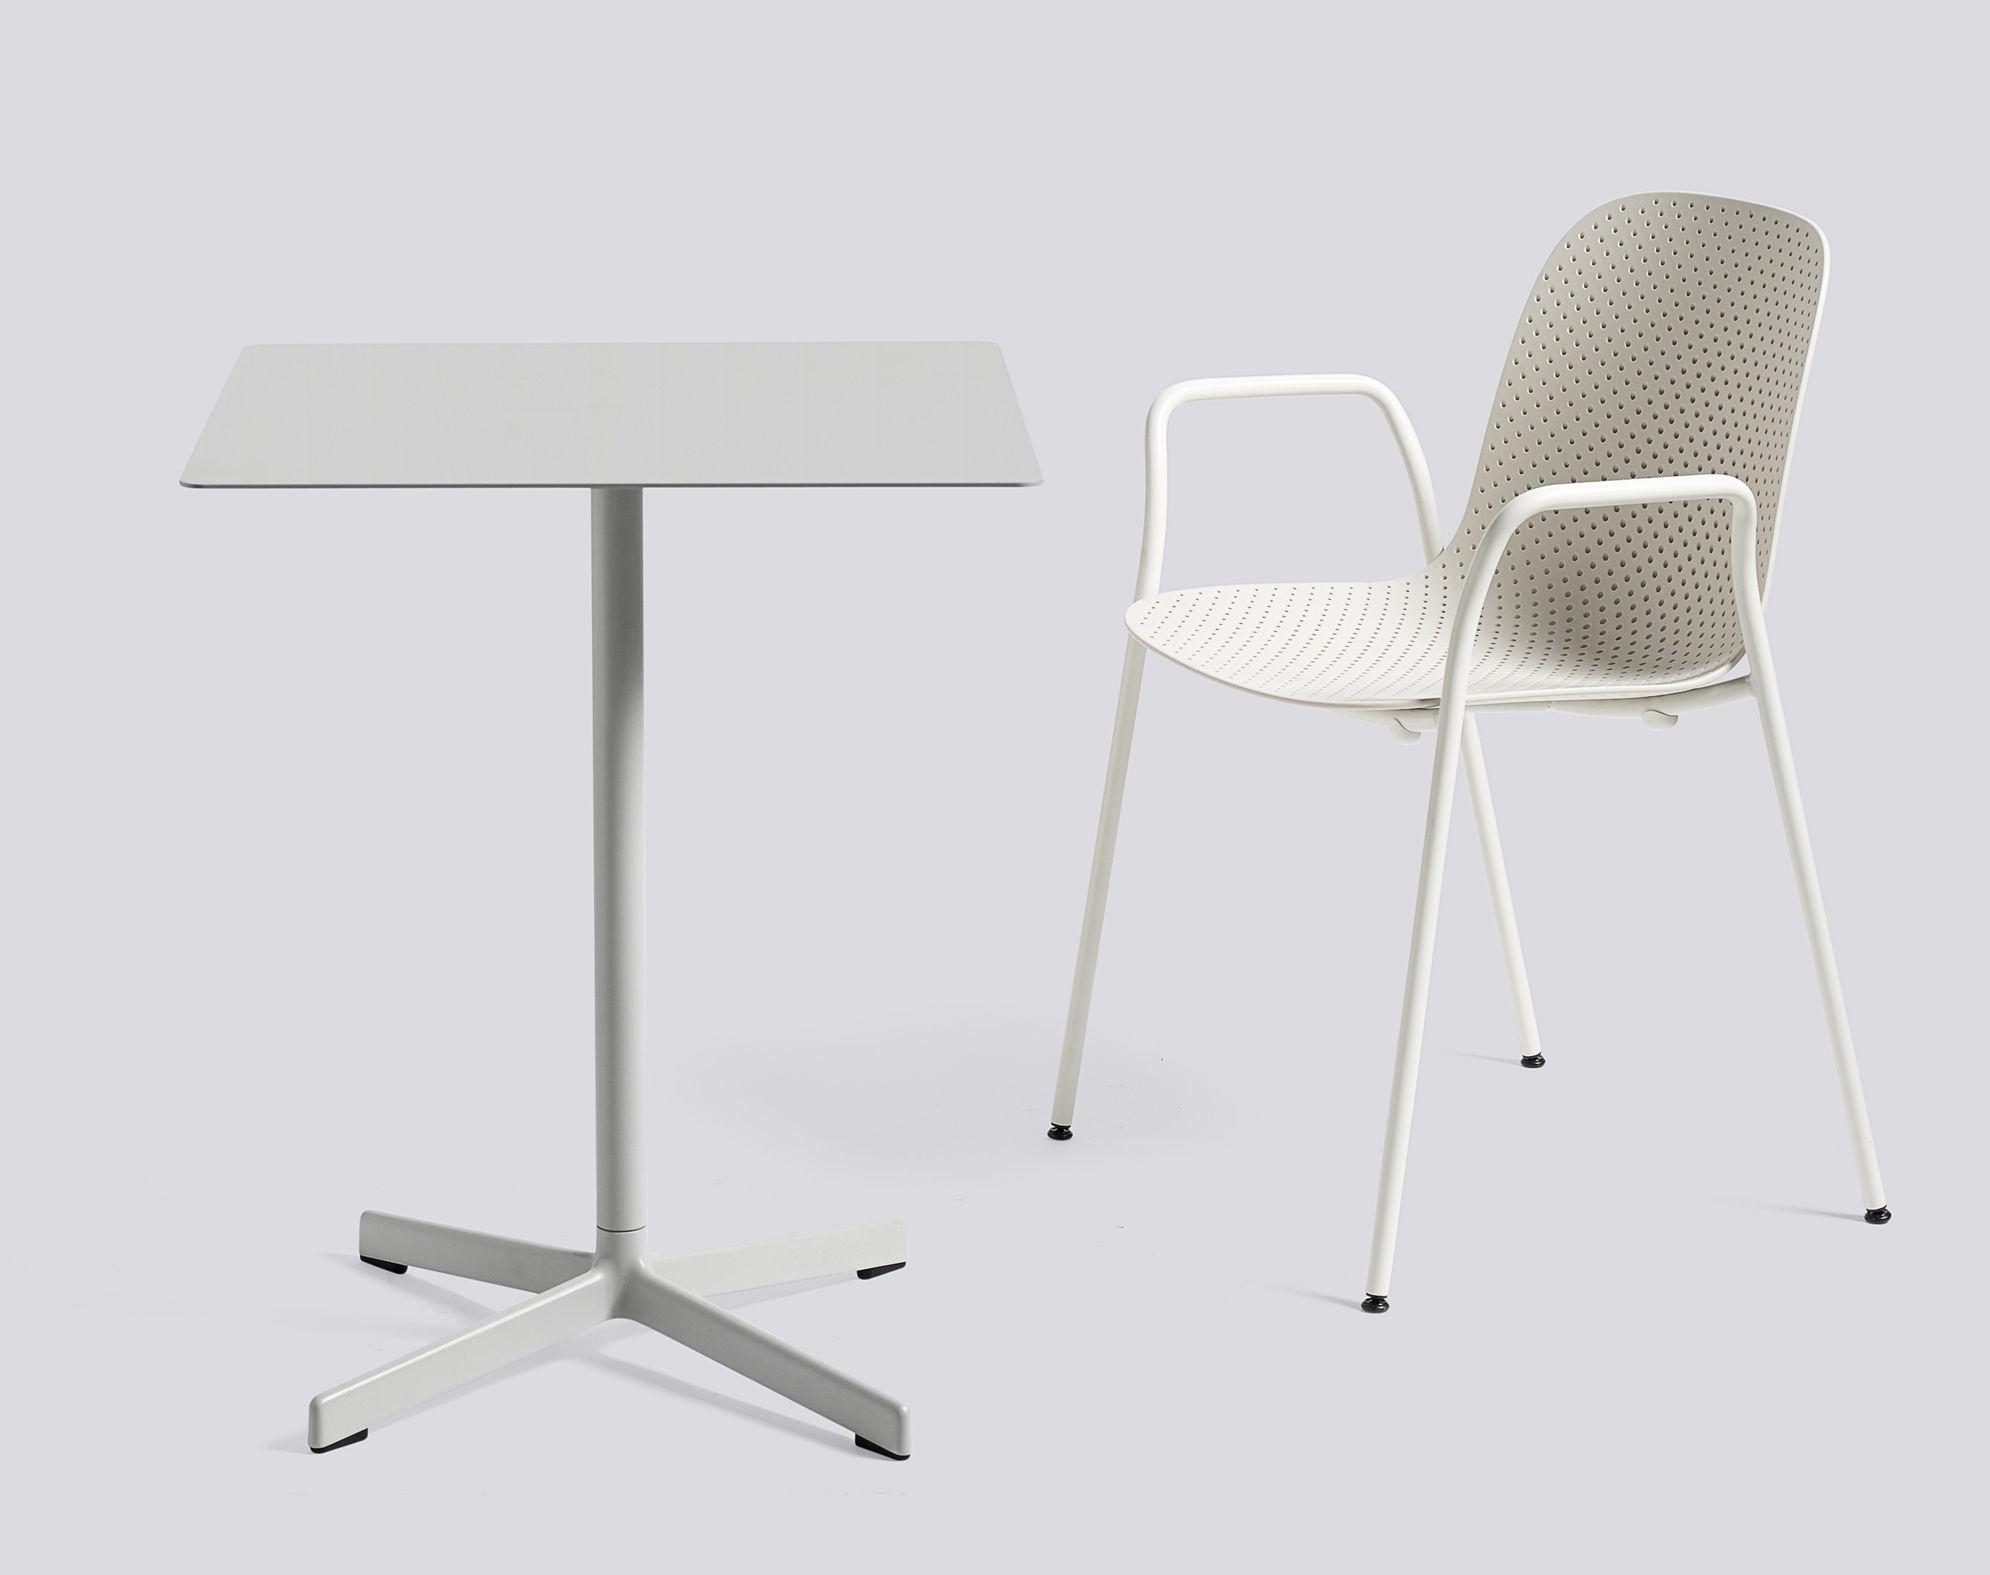 neu tisch 60 x 60 cm metall hellgrau by hay made. Black Bedroom Furniture Sets. Home Design Ideas